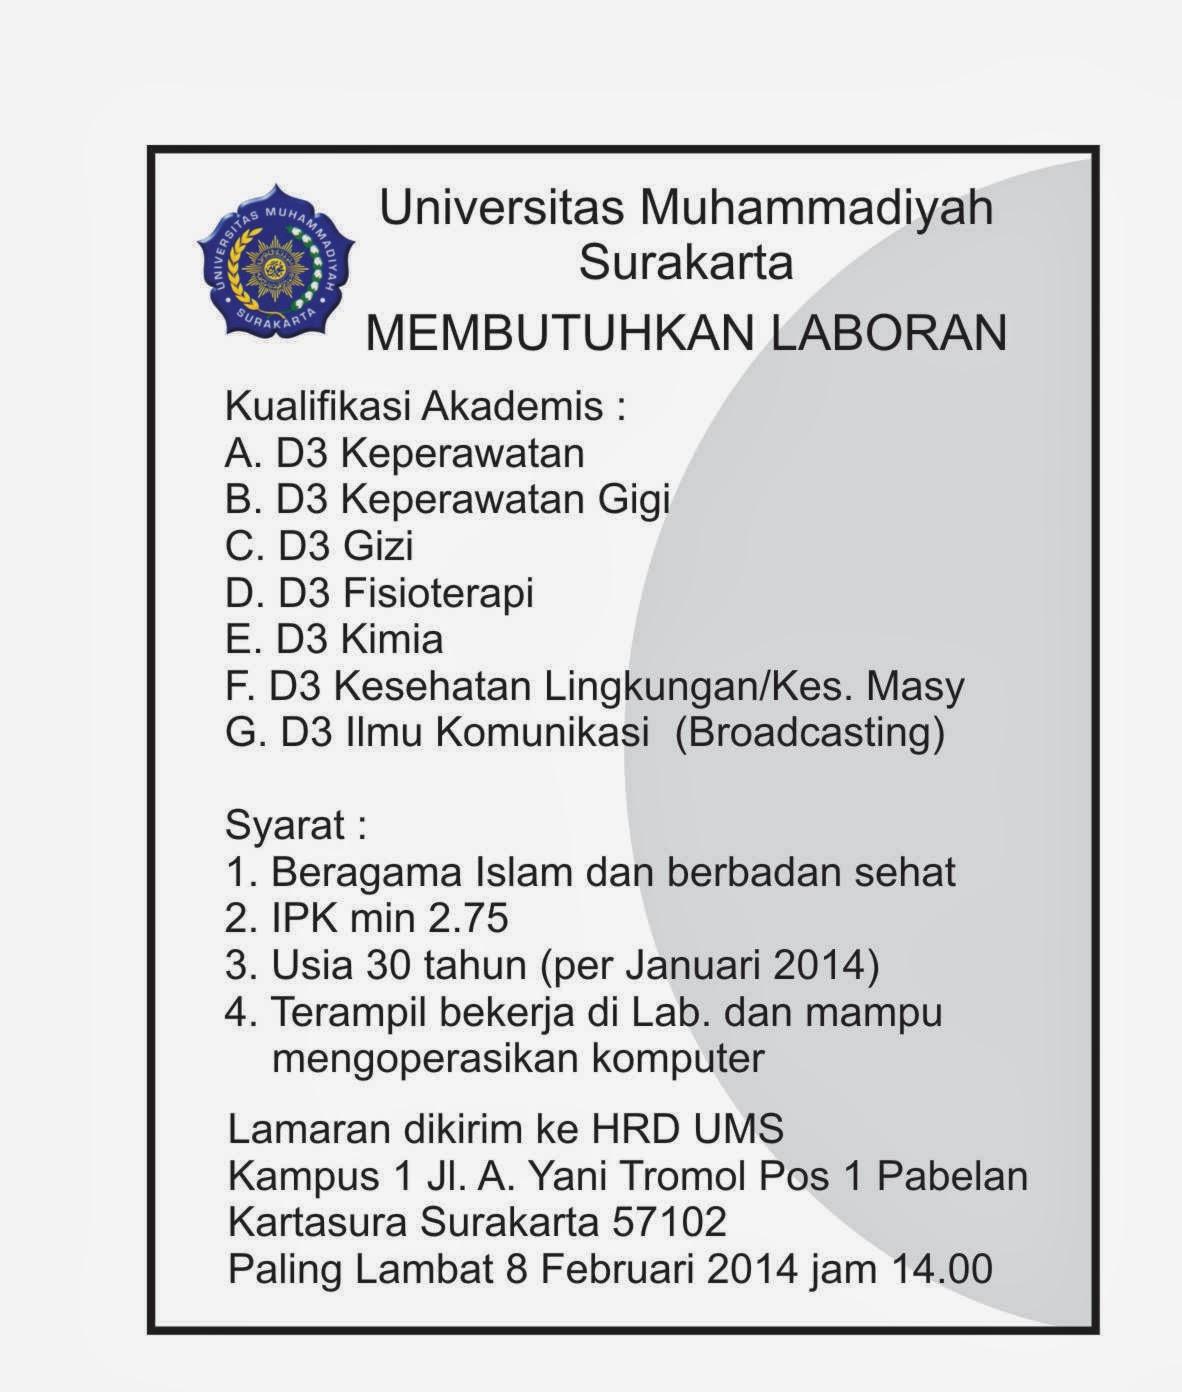 Lowongan Tenaga Laboran Univ Muhammadiyah Surakarta